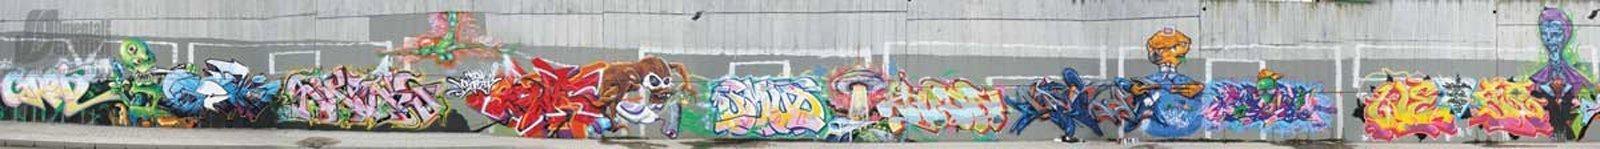 3-4-TCM-2011-MEDELLÍN